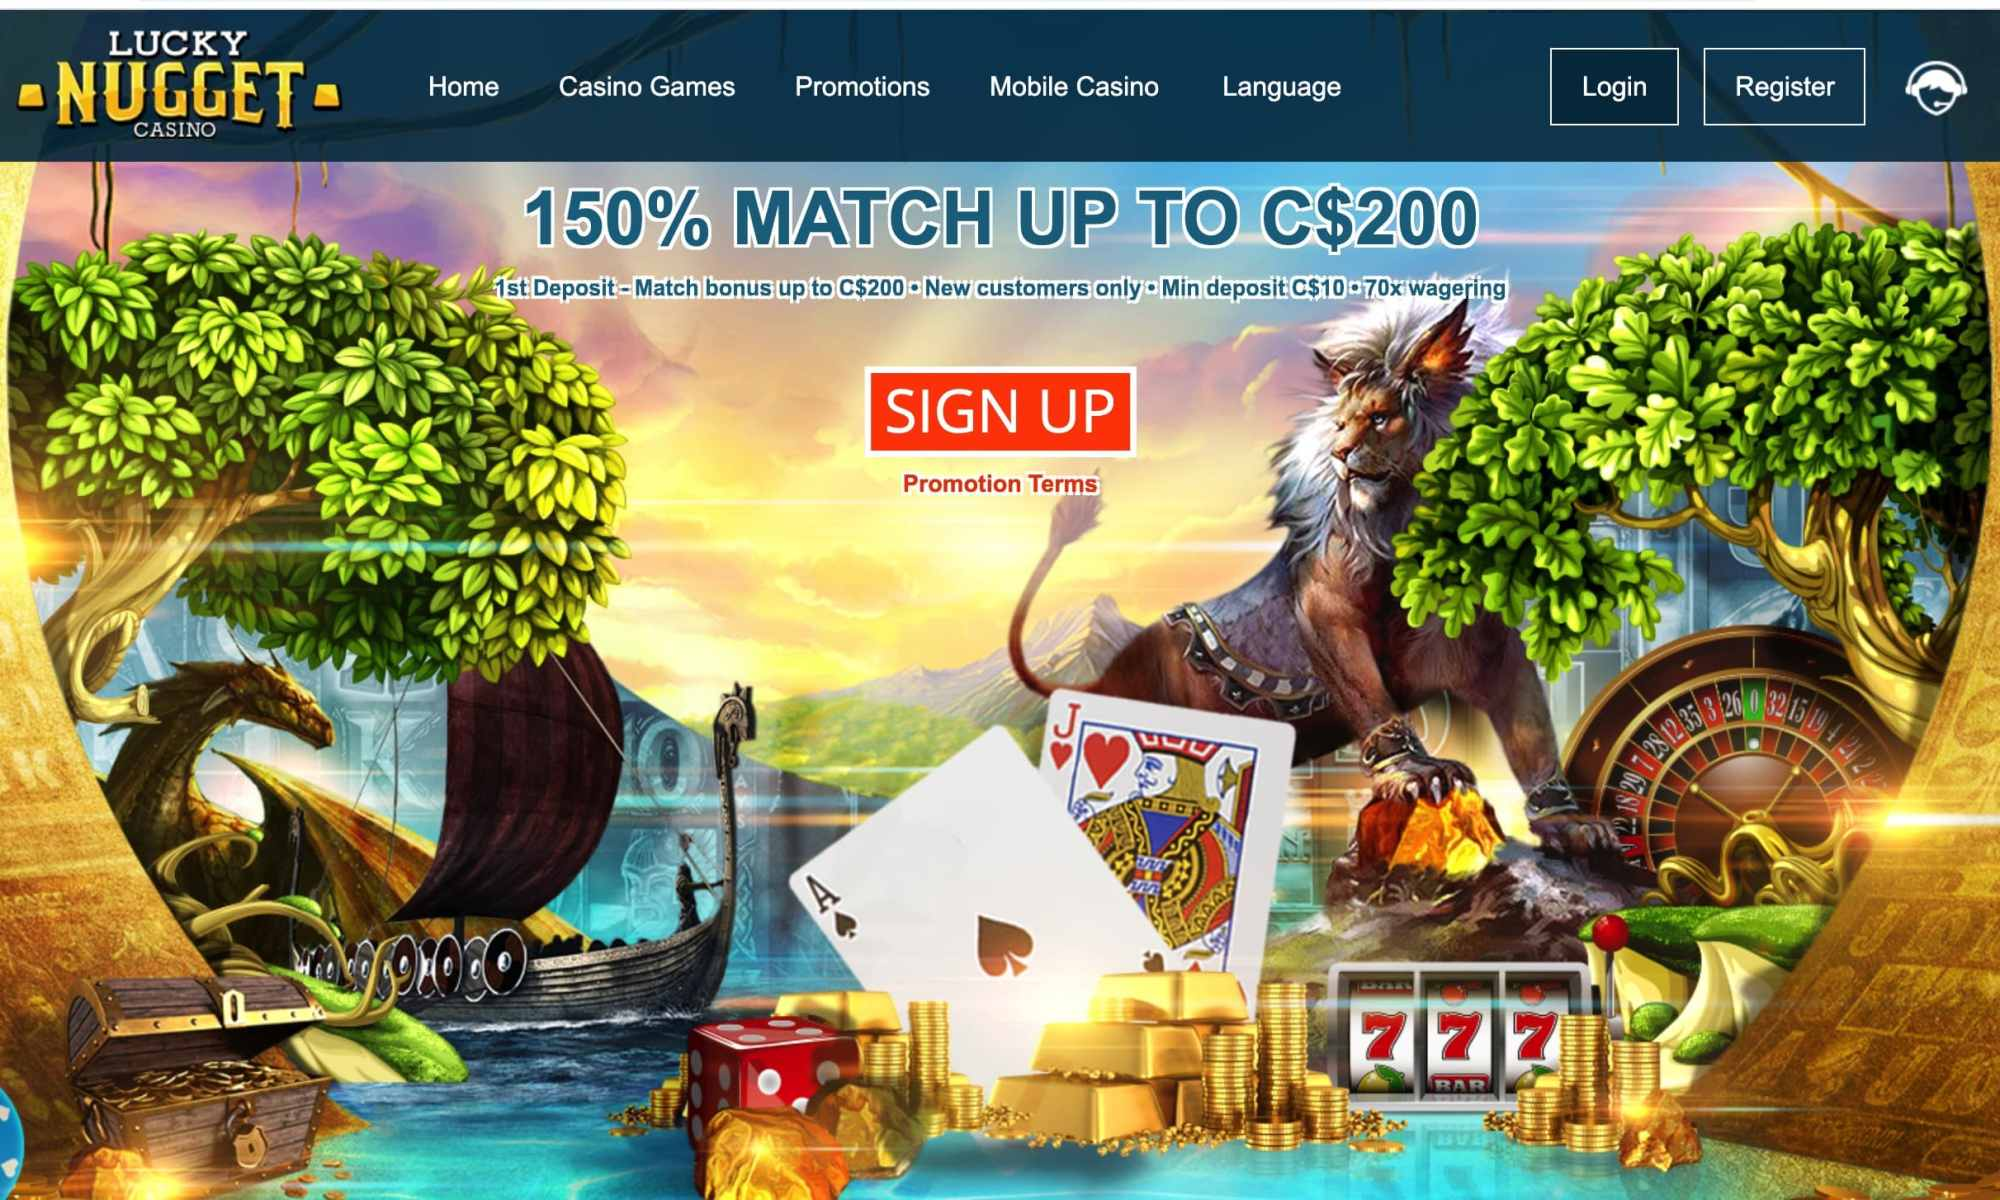 Lucky Nugget Casino - 150% deposit bonus of up to $200